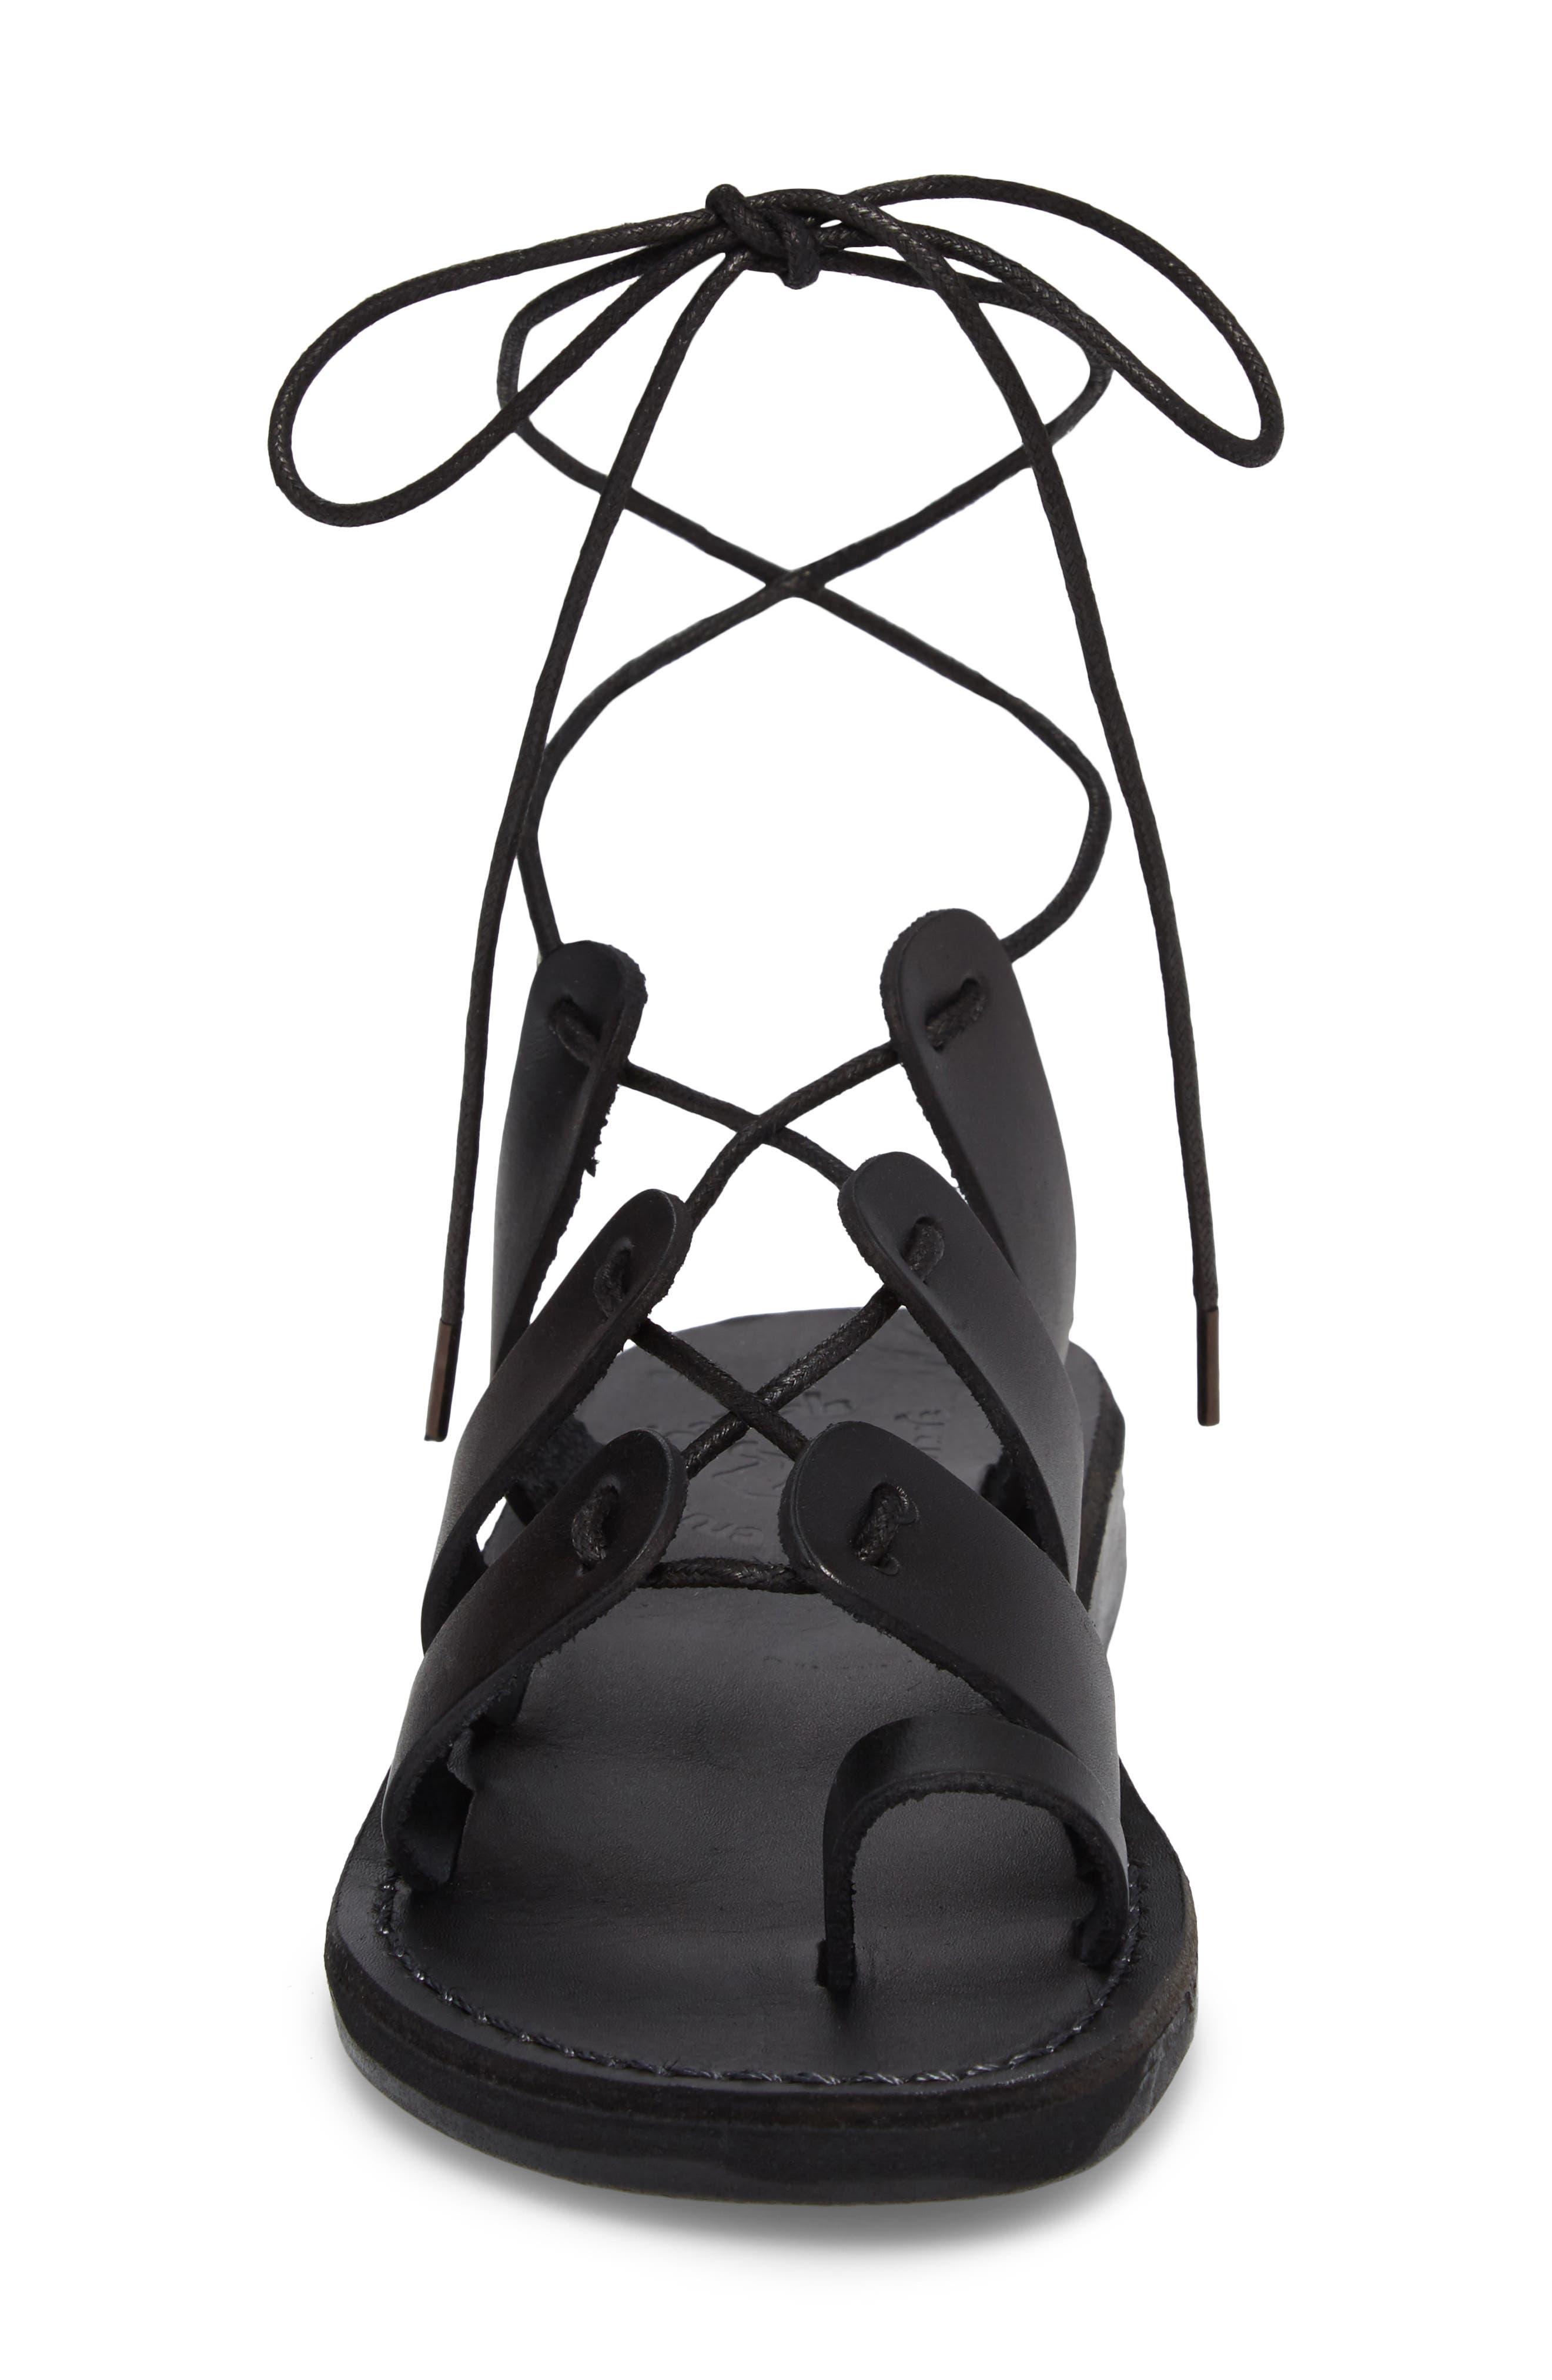 Deborah Wraparound Laces Sandal,                             Alternate thumbnail 4, color,                             BLACK LEATHER